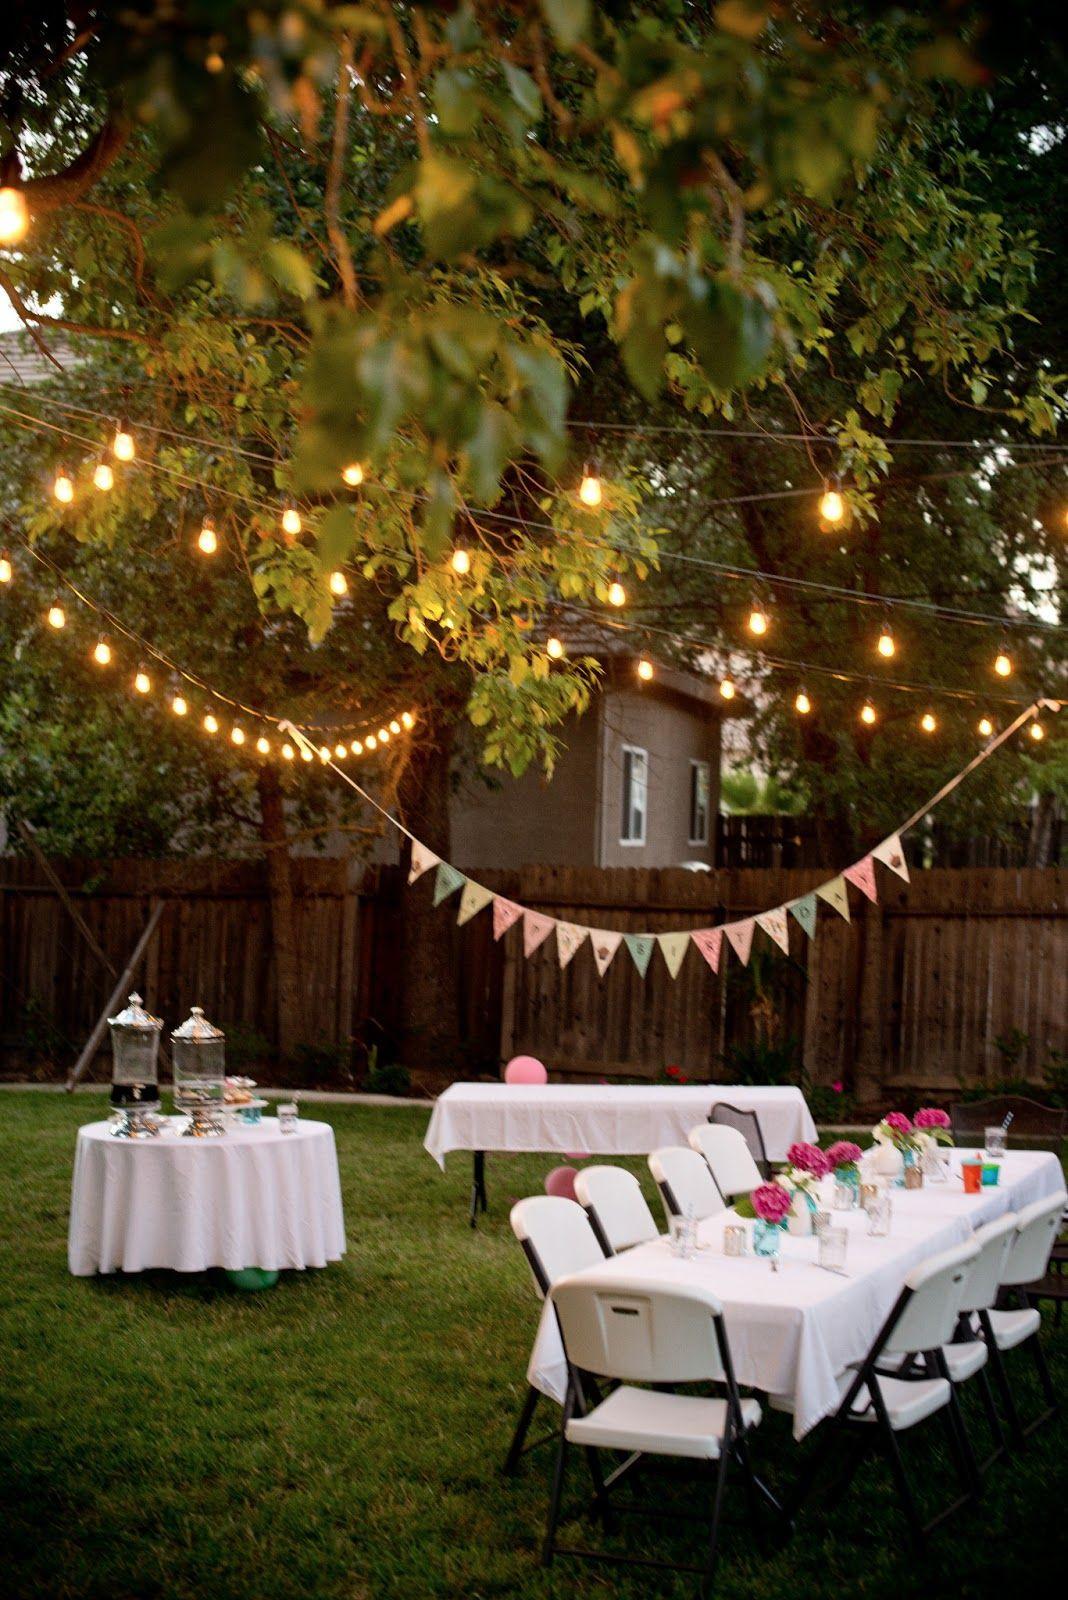 Graduation Party Ideas For Backyard  Backyard Birthday Fun Pink Hydrangeas Polka Dot Napkins